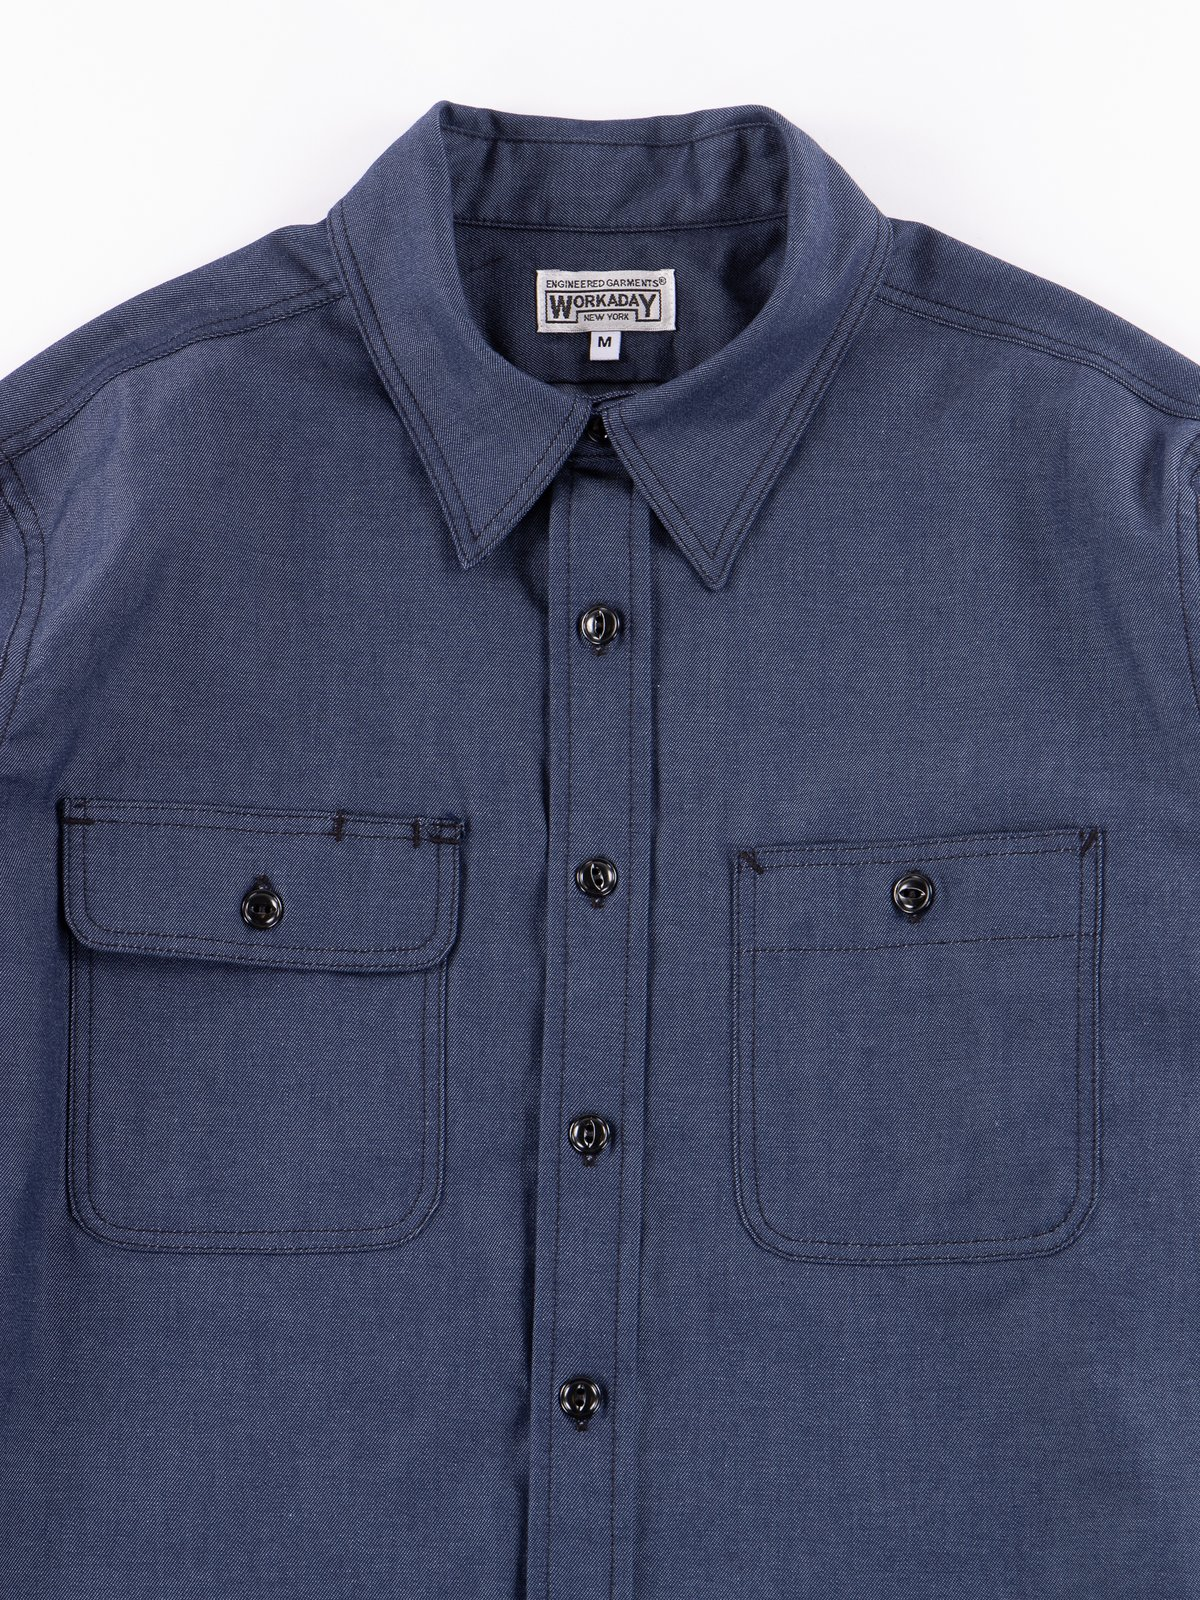 Indigo Cotton Denim Utility Shirt - Image 2